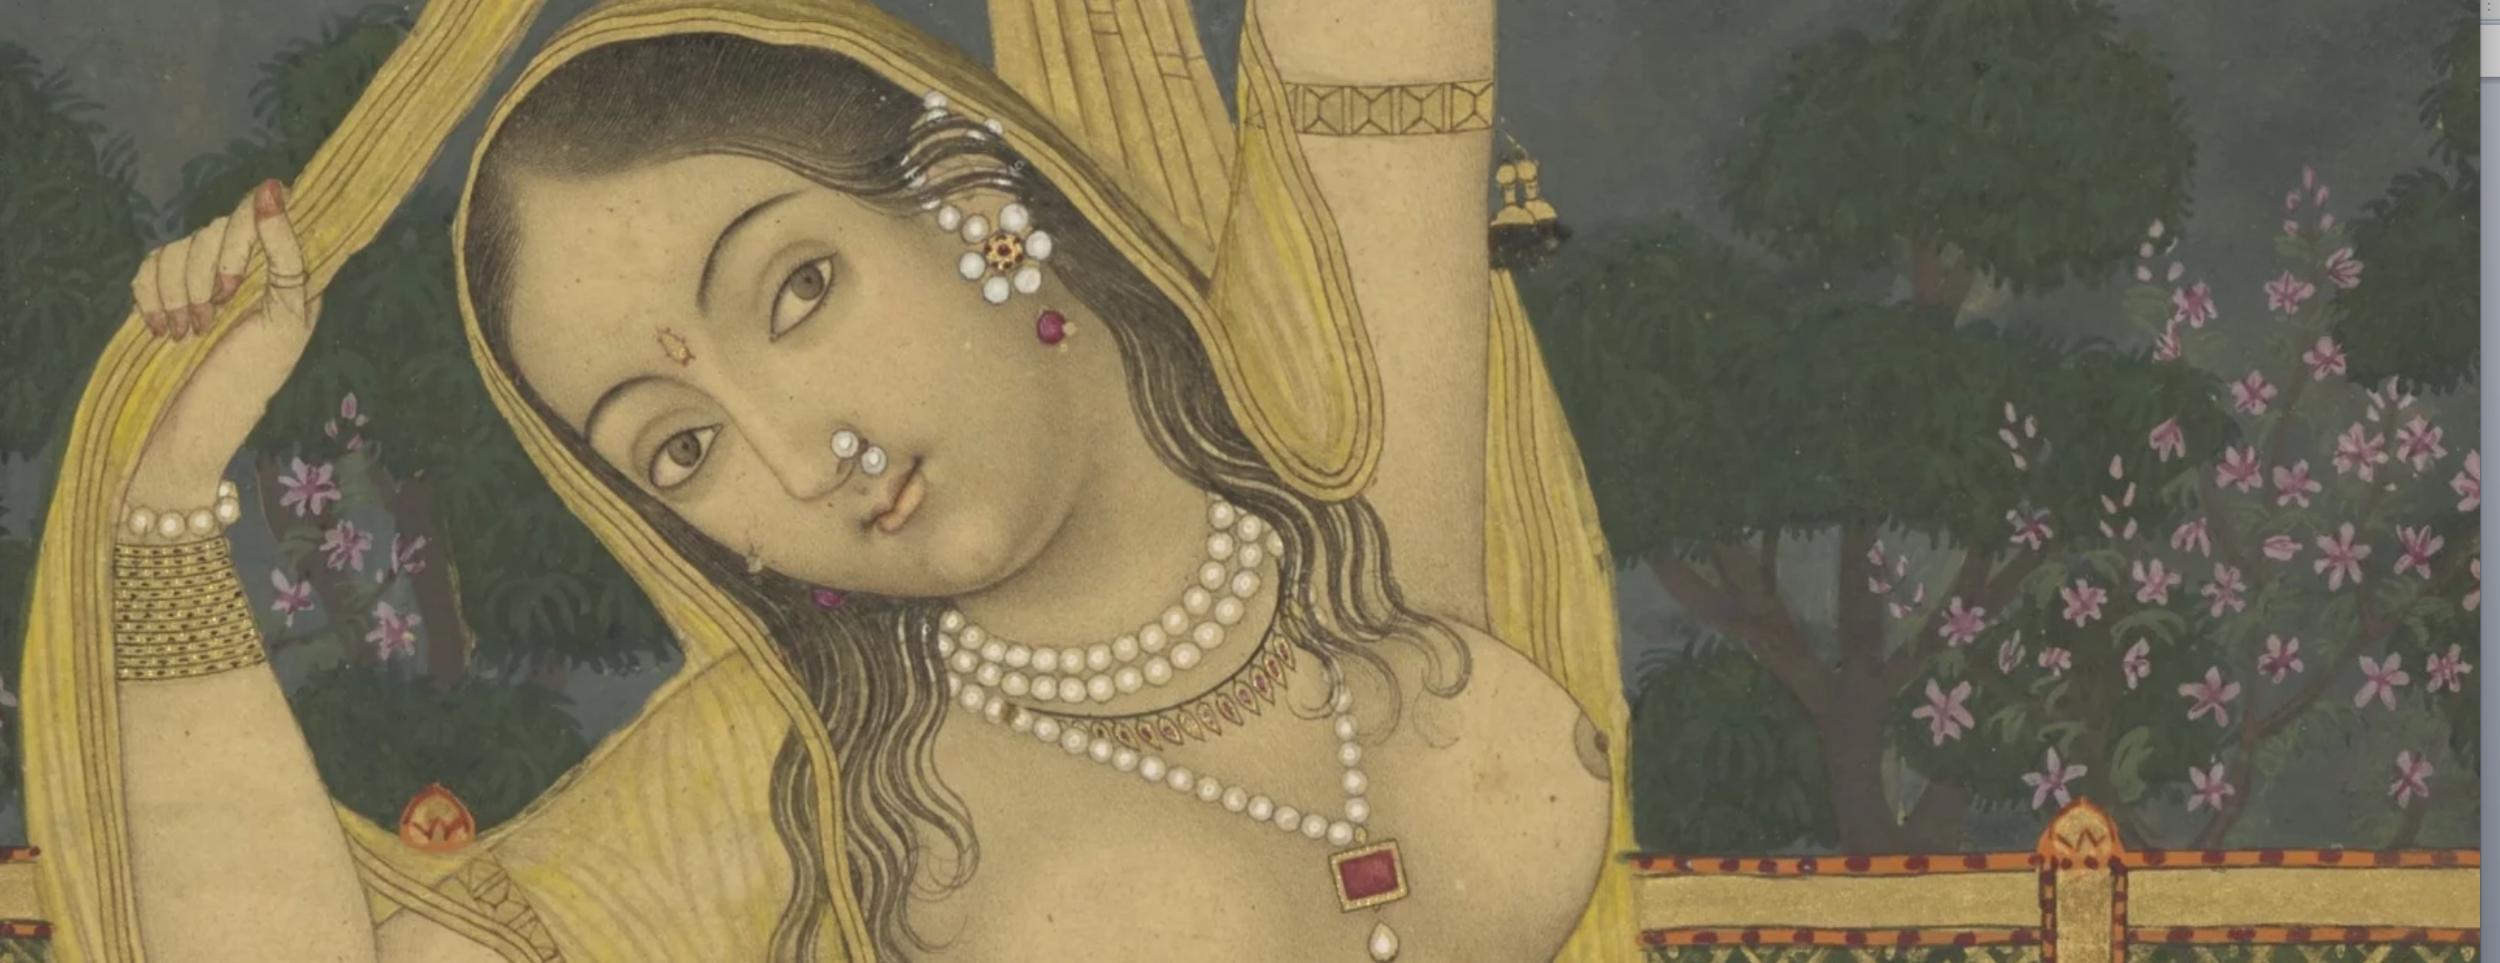 Splendours of the Subcontinent. Elena Odissi